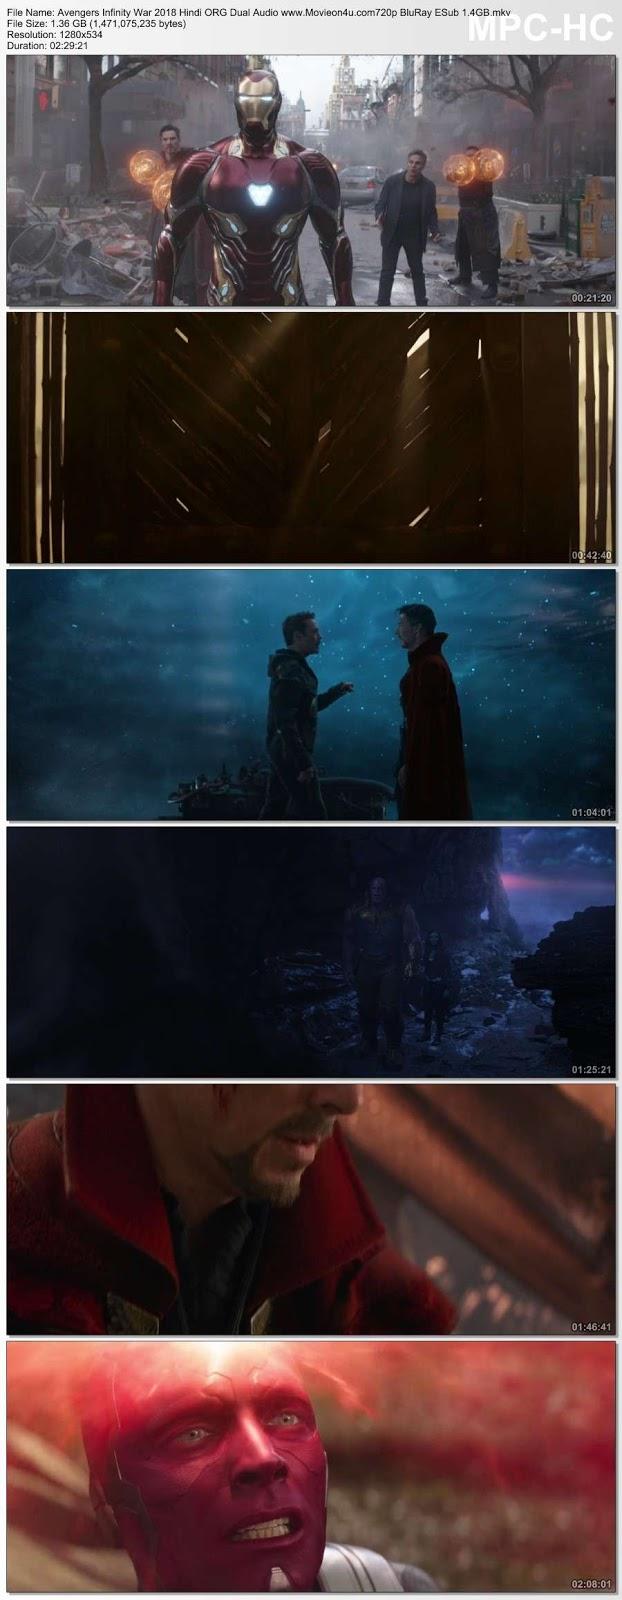 Avengers: Infinity War (2018) Hindi ORG Dual Audio 720p BluRay x264 ESub 1.4GB Download HD